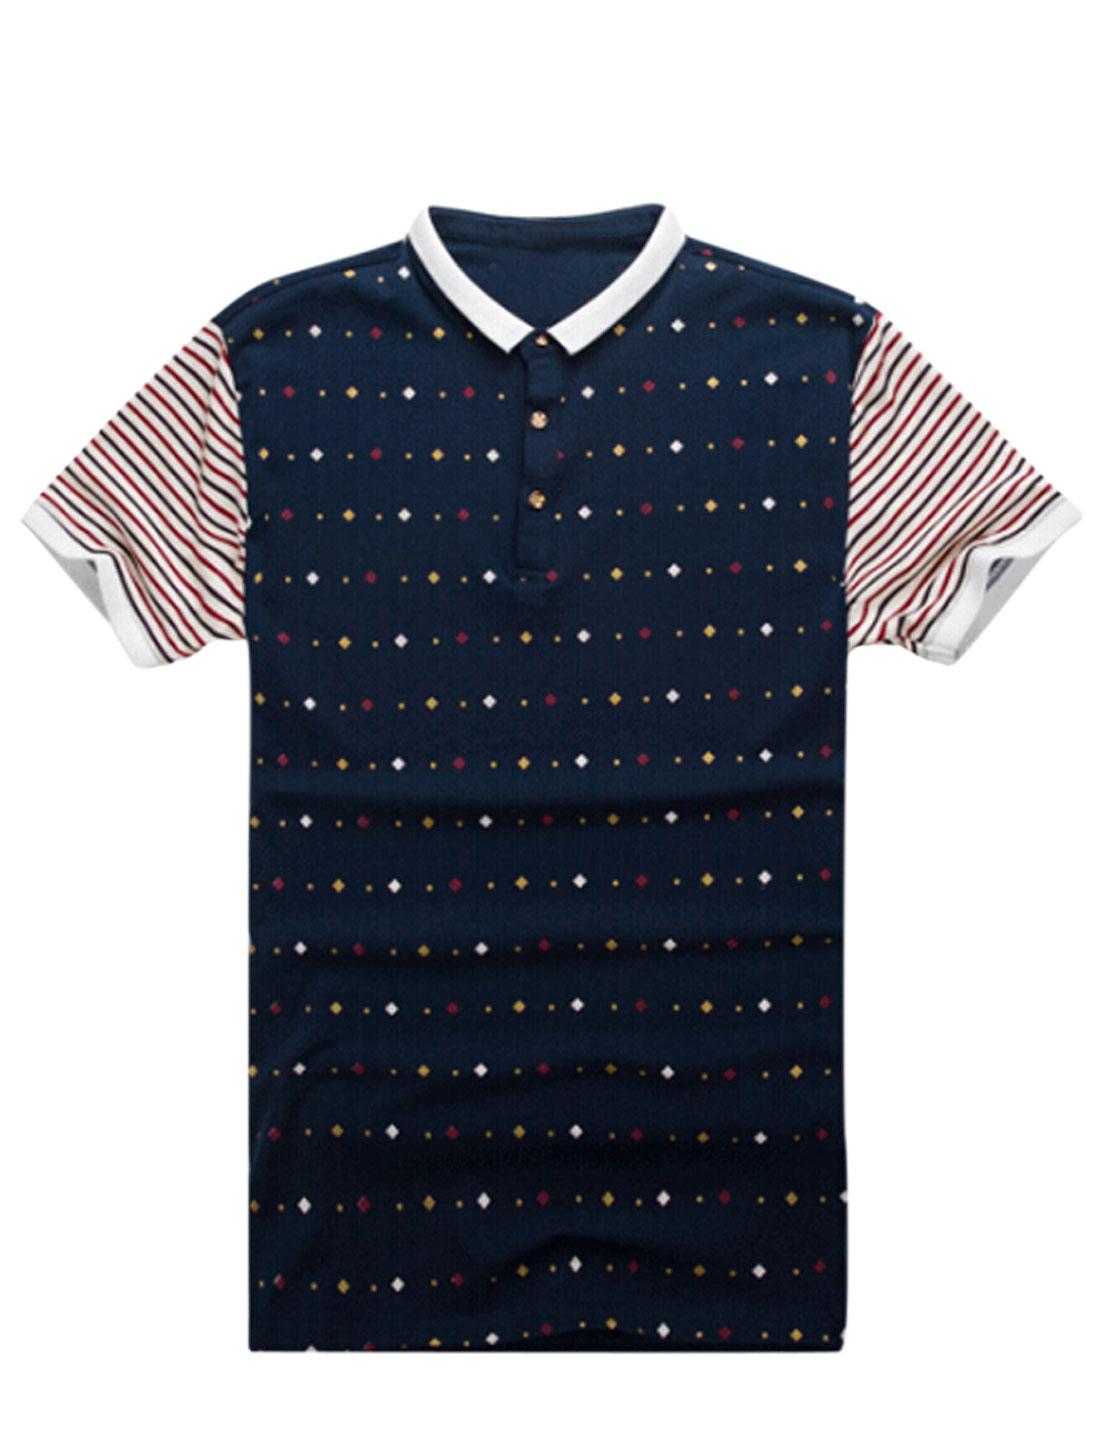 Men Stripes Geometric Prints Panel Casual T-shirt Navy Blue Beige M